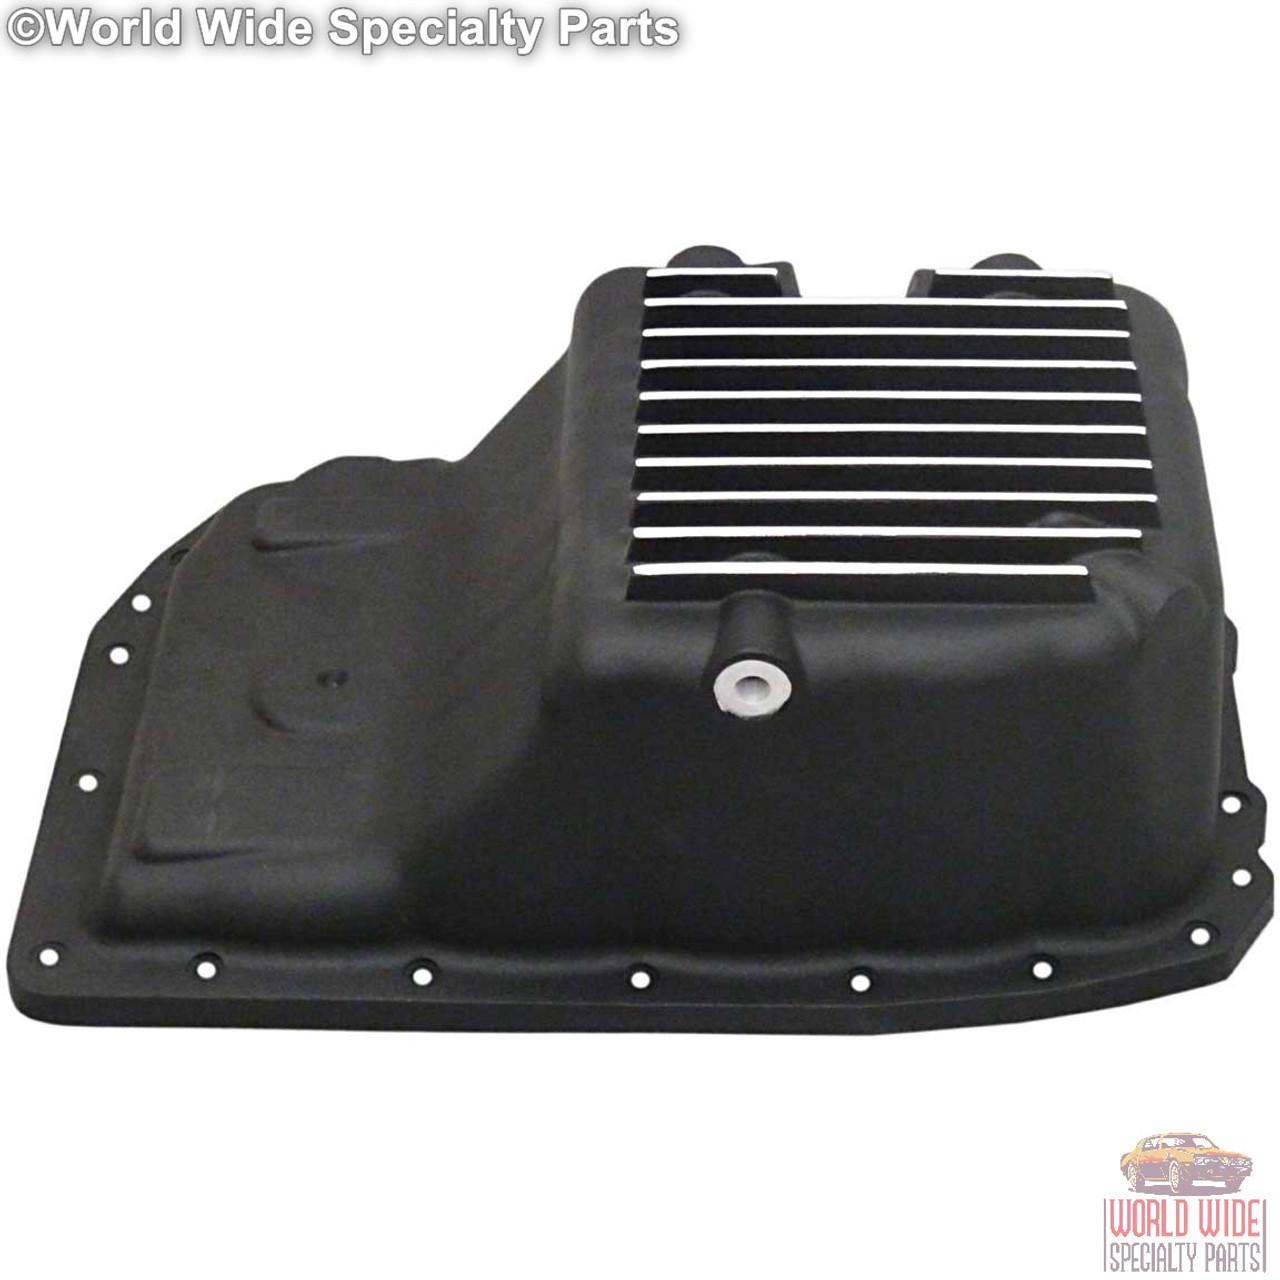 GM 6L80 Deep Transmission Pan, 2 Qts Extra Capacity, 2007-UP, Black Powder Coat